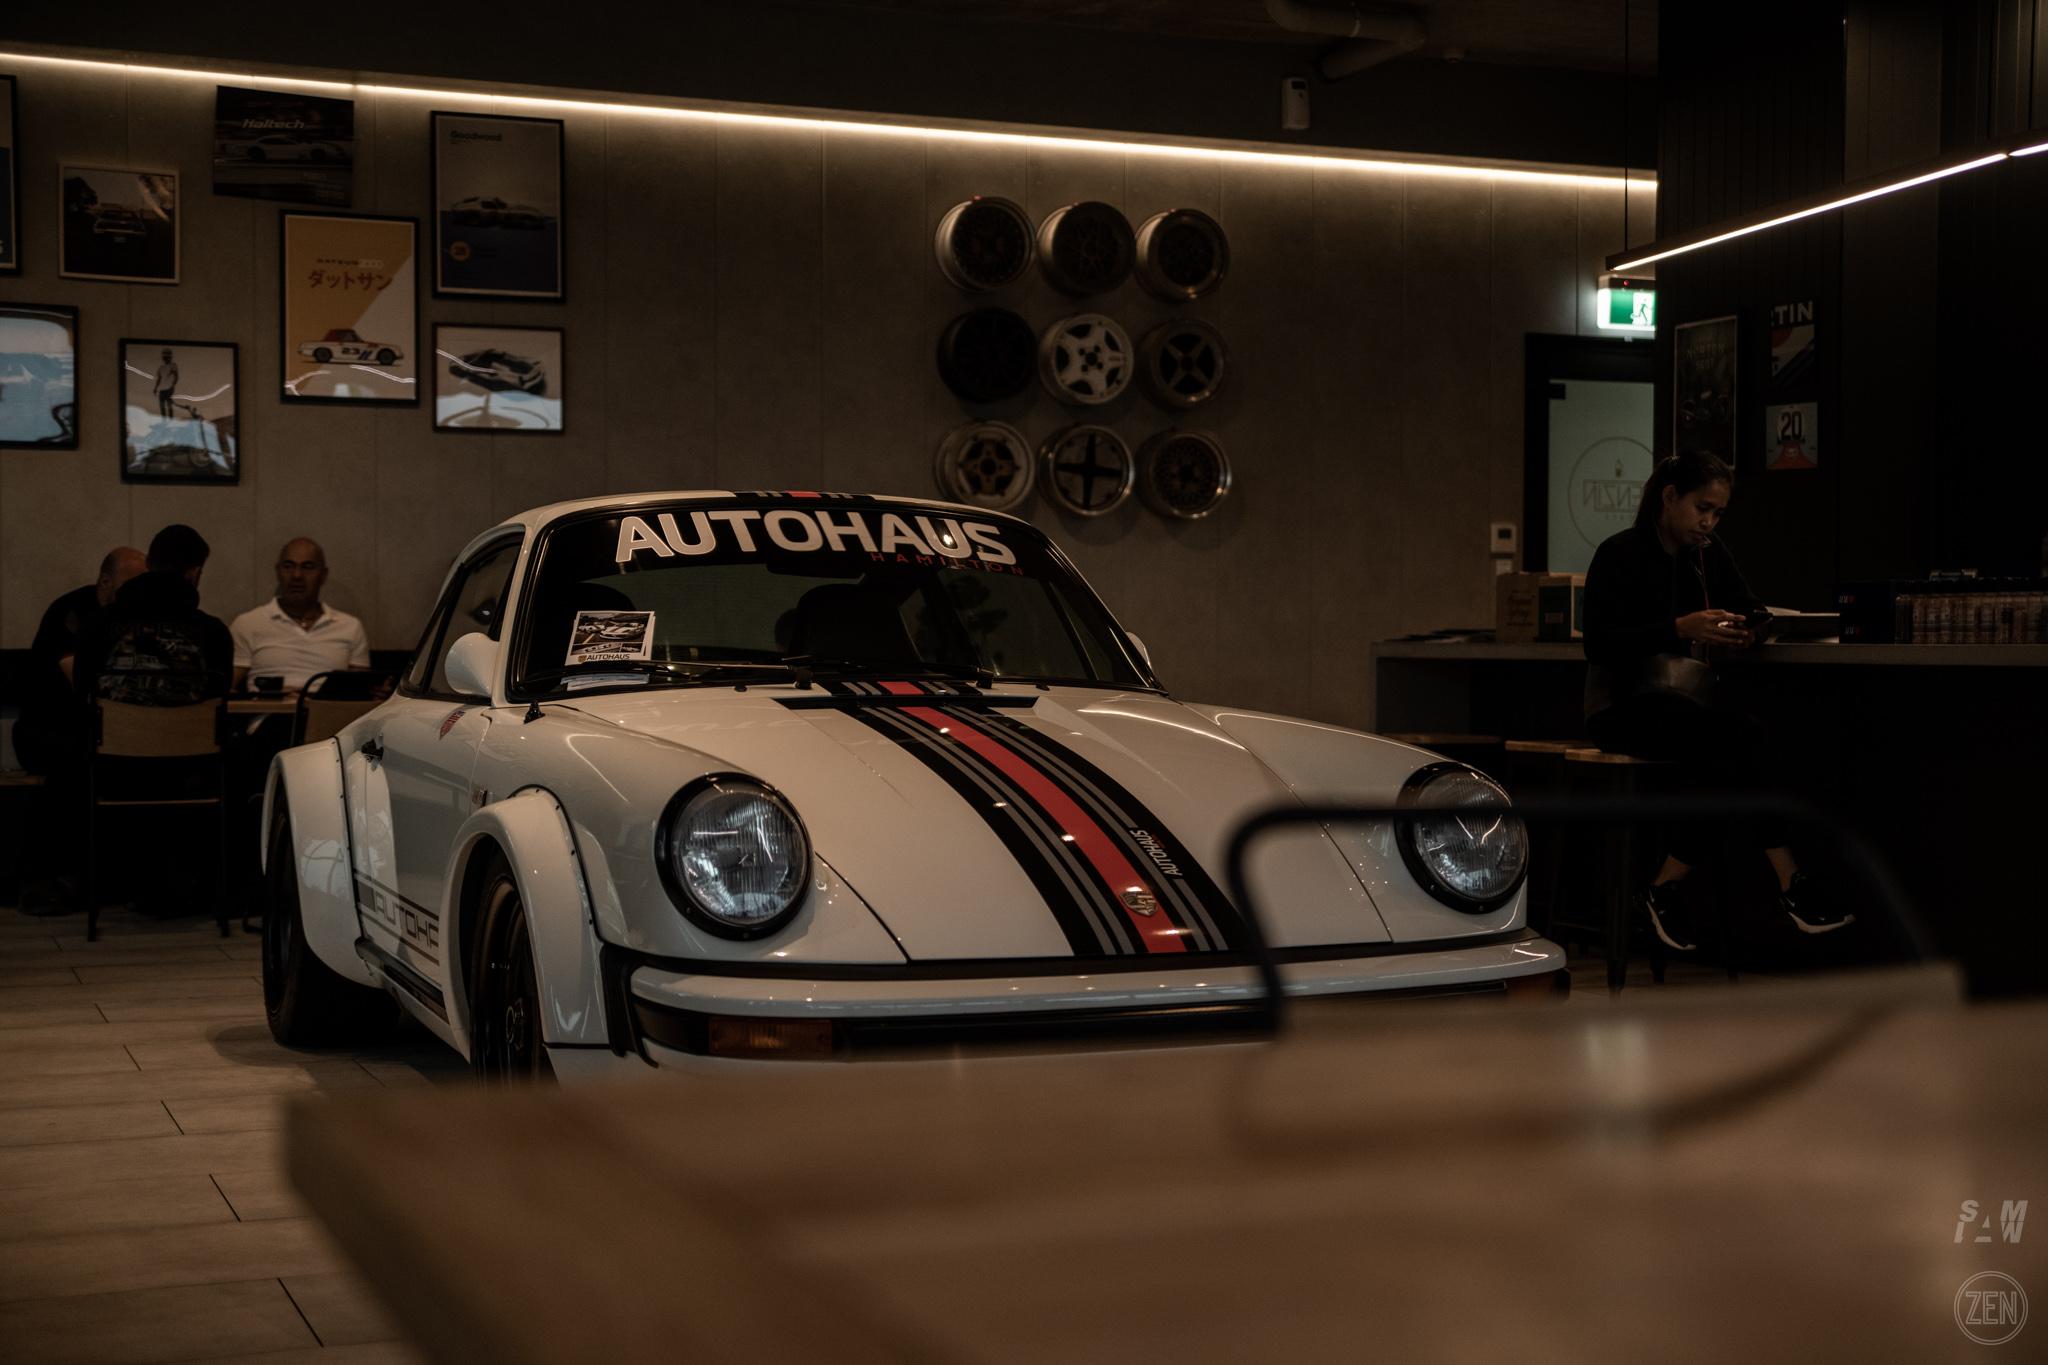 2021-02-27 - Benzin x Autohaus Grp 4 001